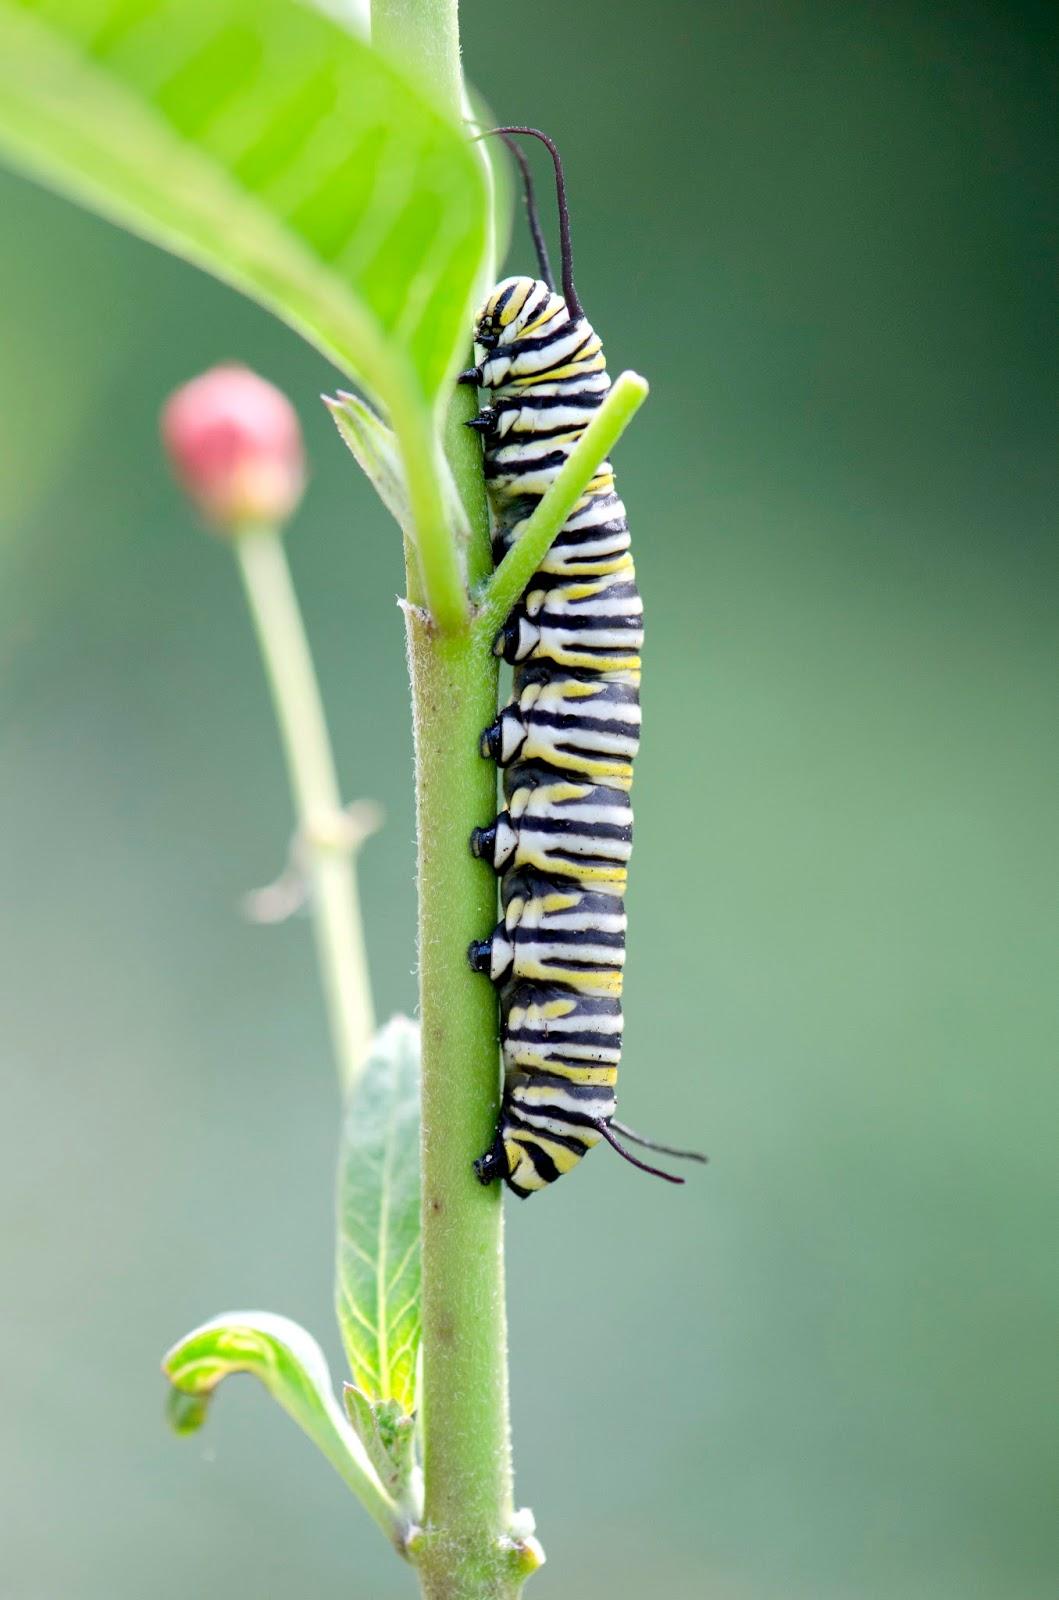 urban wildlife guide august 2017 rh urbanwildlifeguide net Butterfly Caterpillar Identification Caterpillars Identification Guide